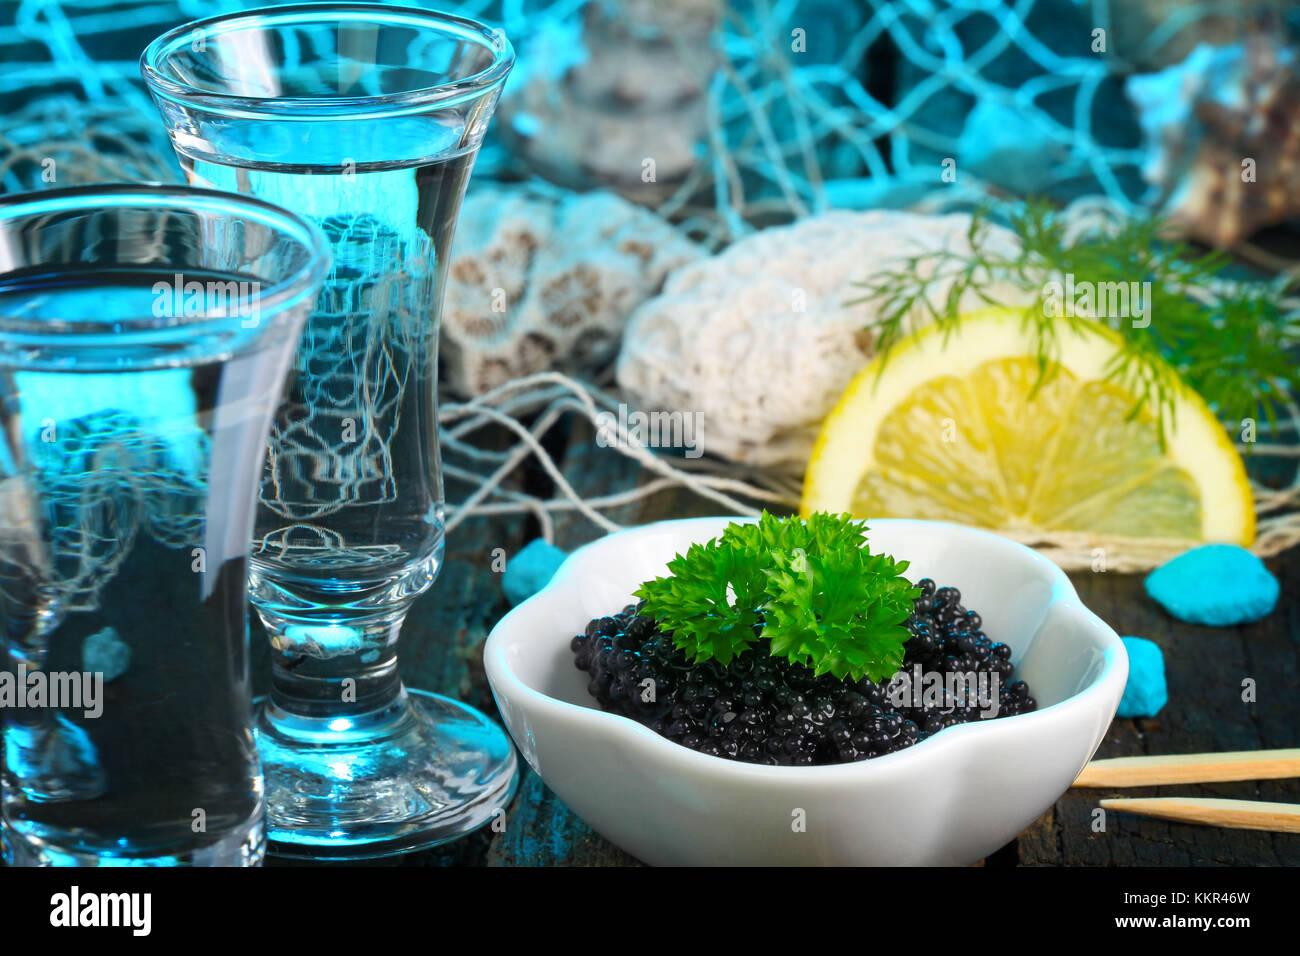 Caviar and vodka - Stock Image